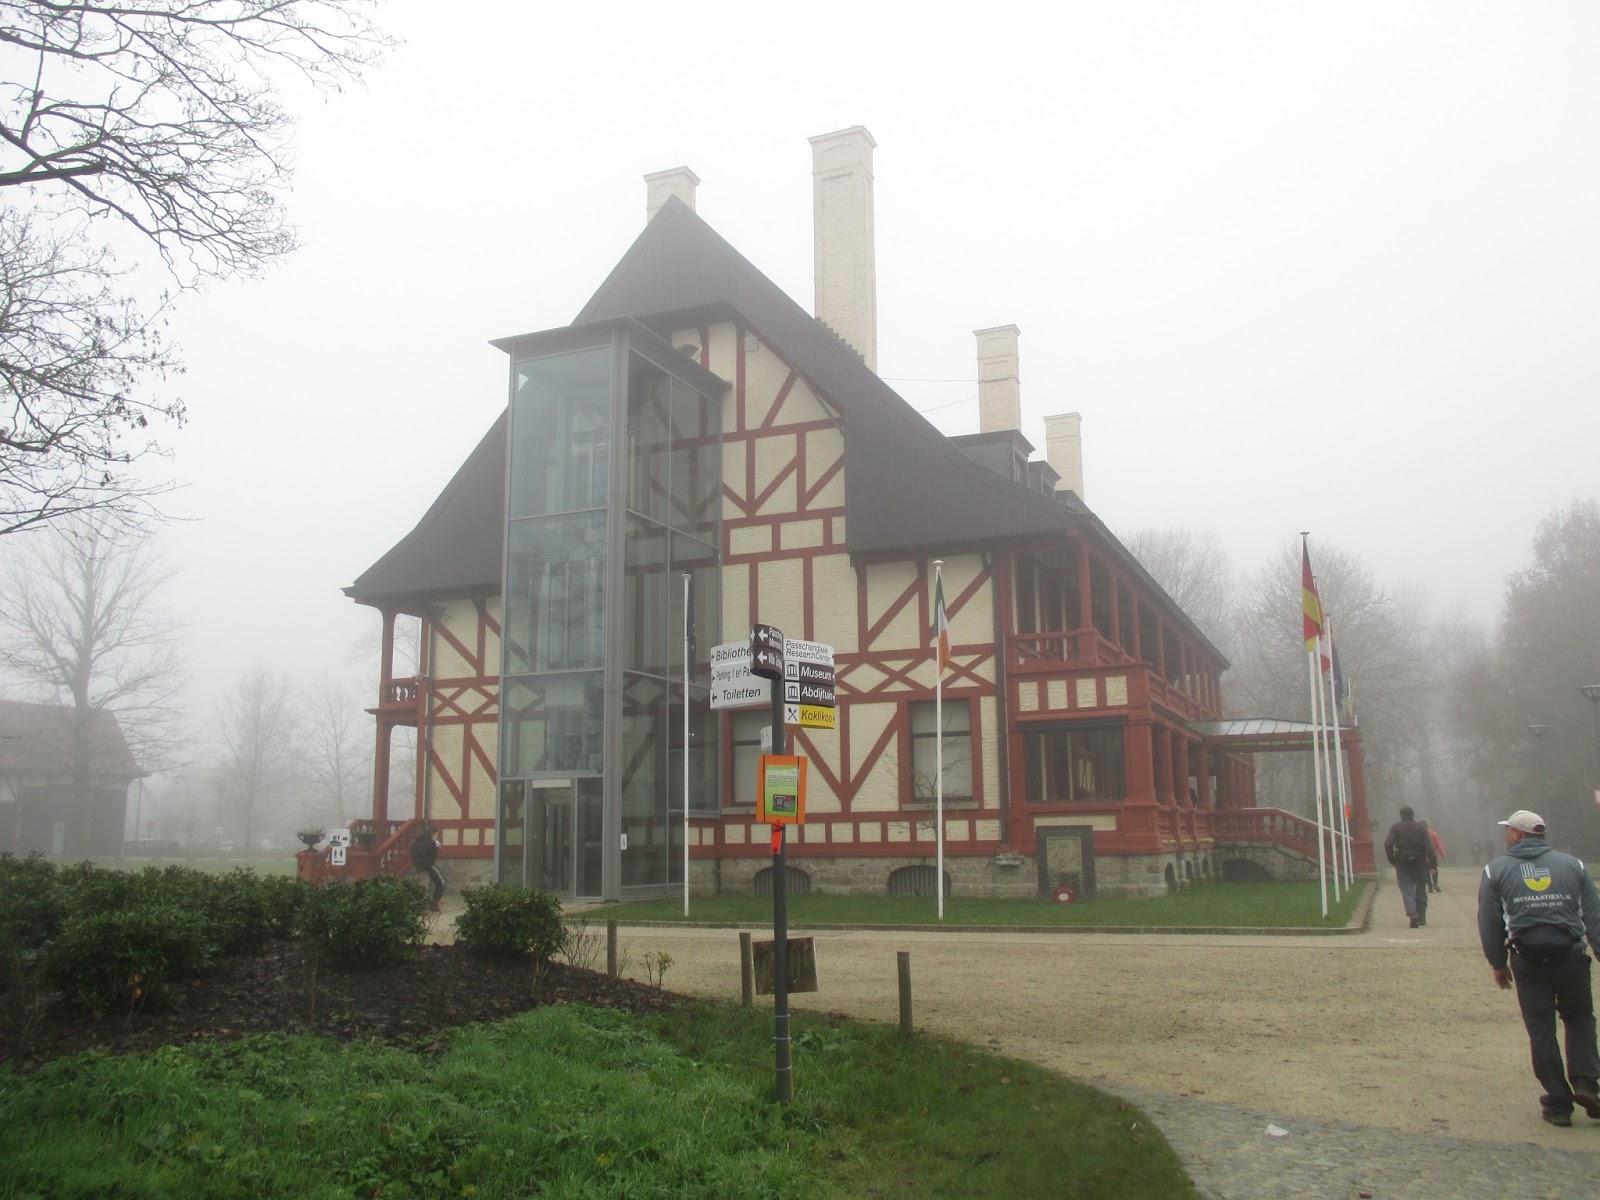 Memorial Museum Passchendaele